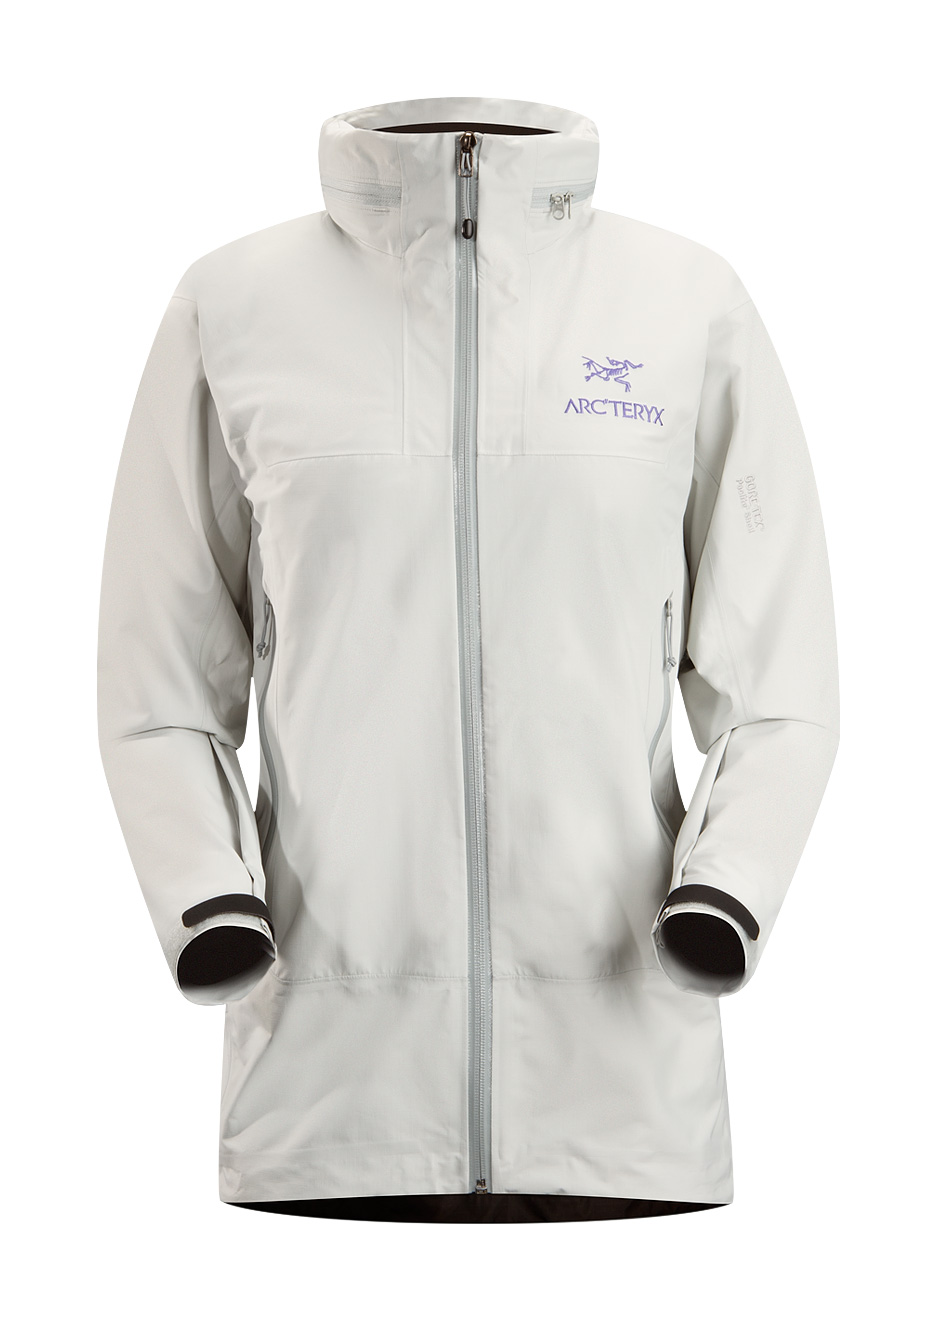 659565a7d Cheap Arc'teryx Men's Hybrid Jackets Outlet Shop